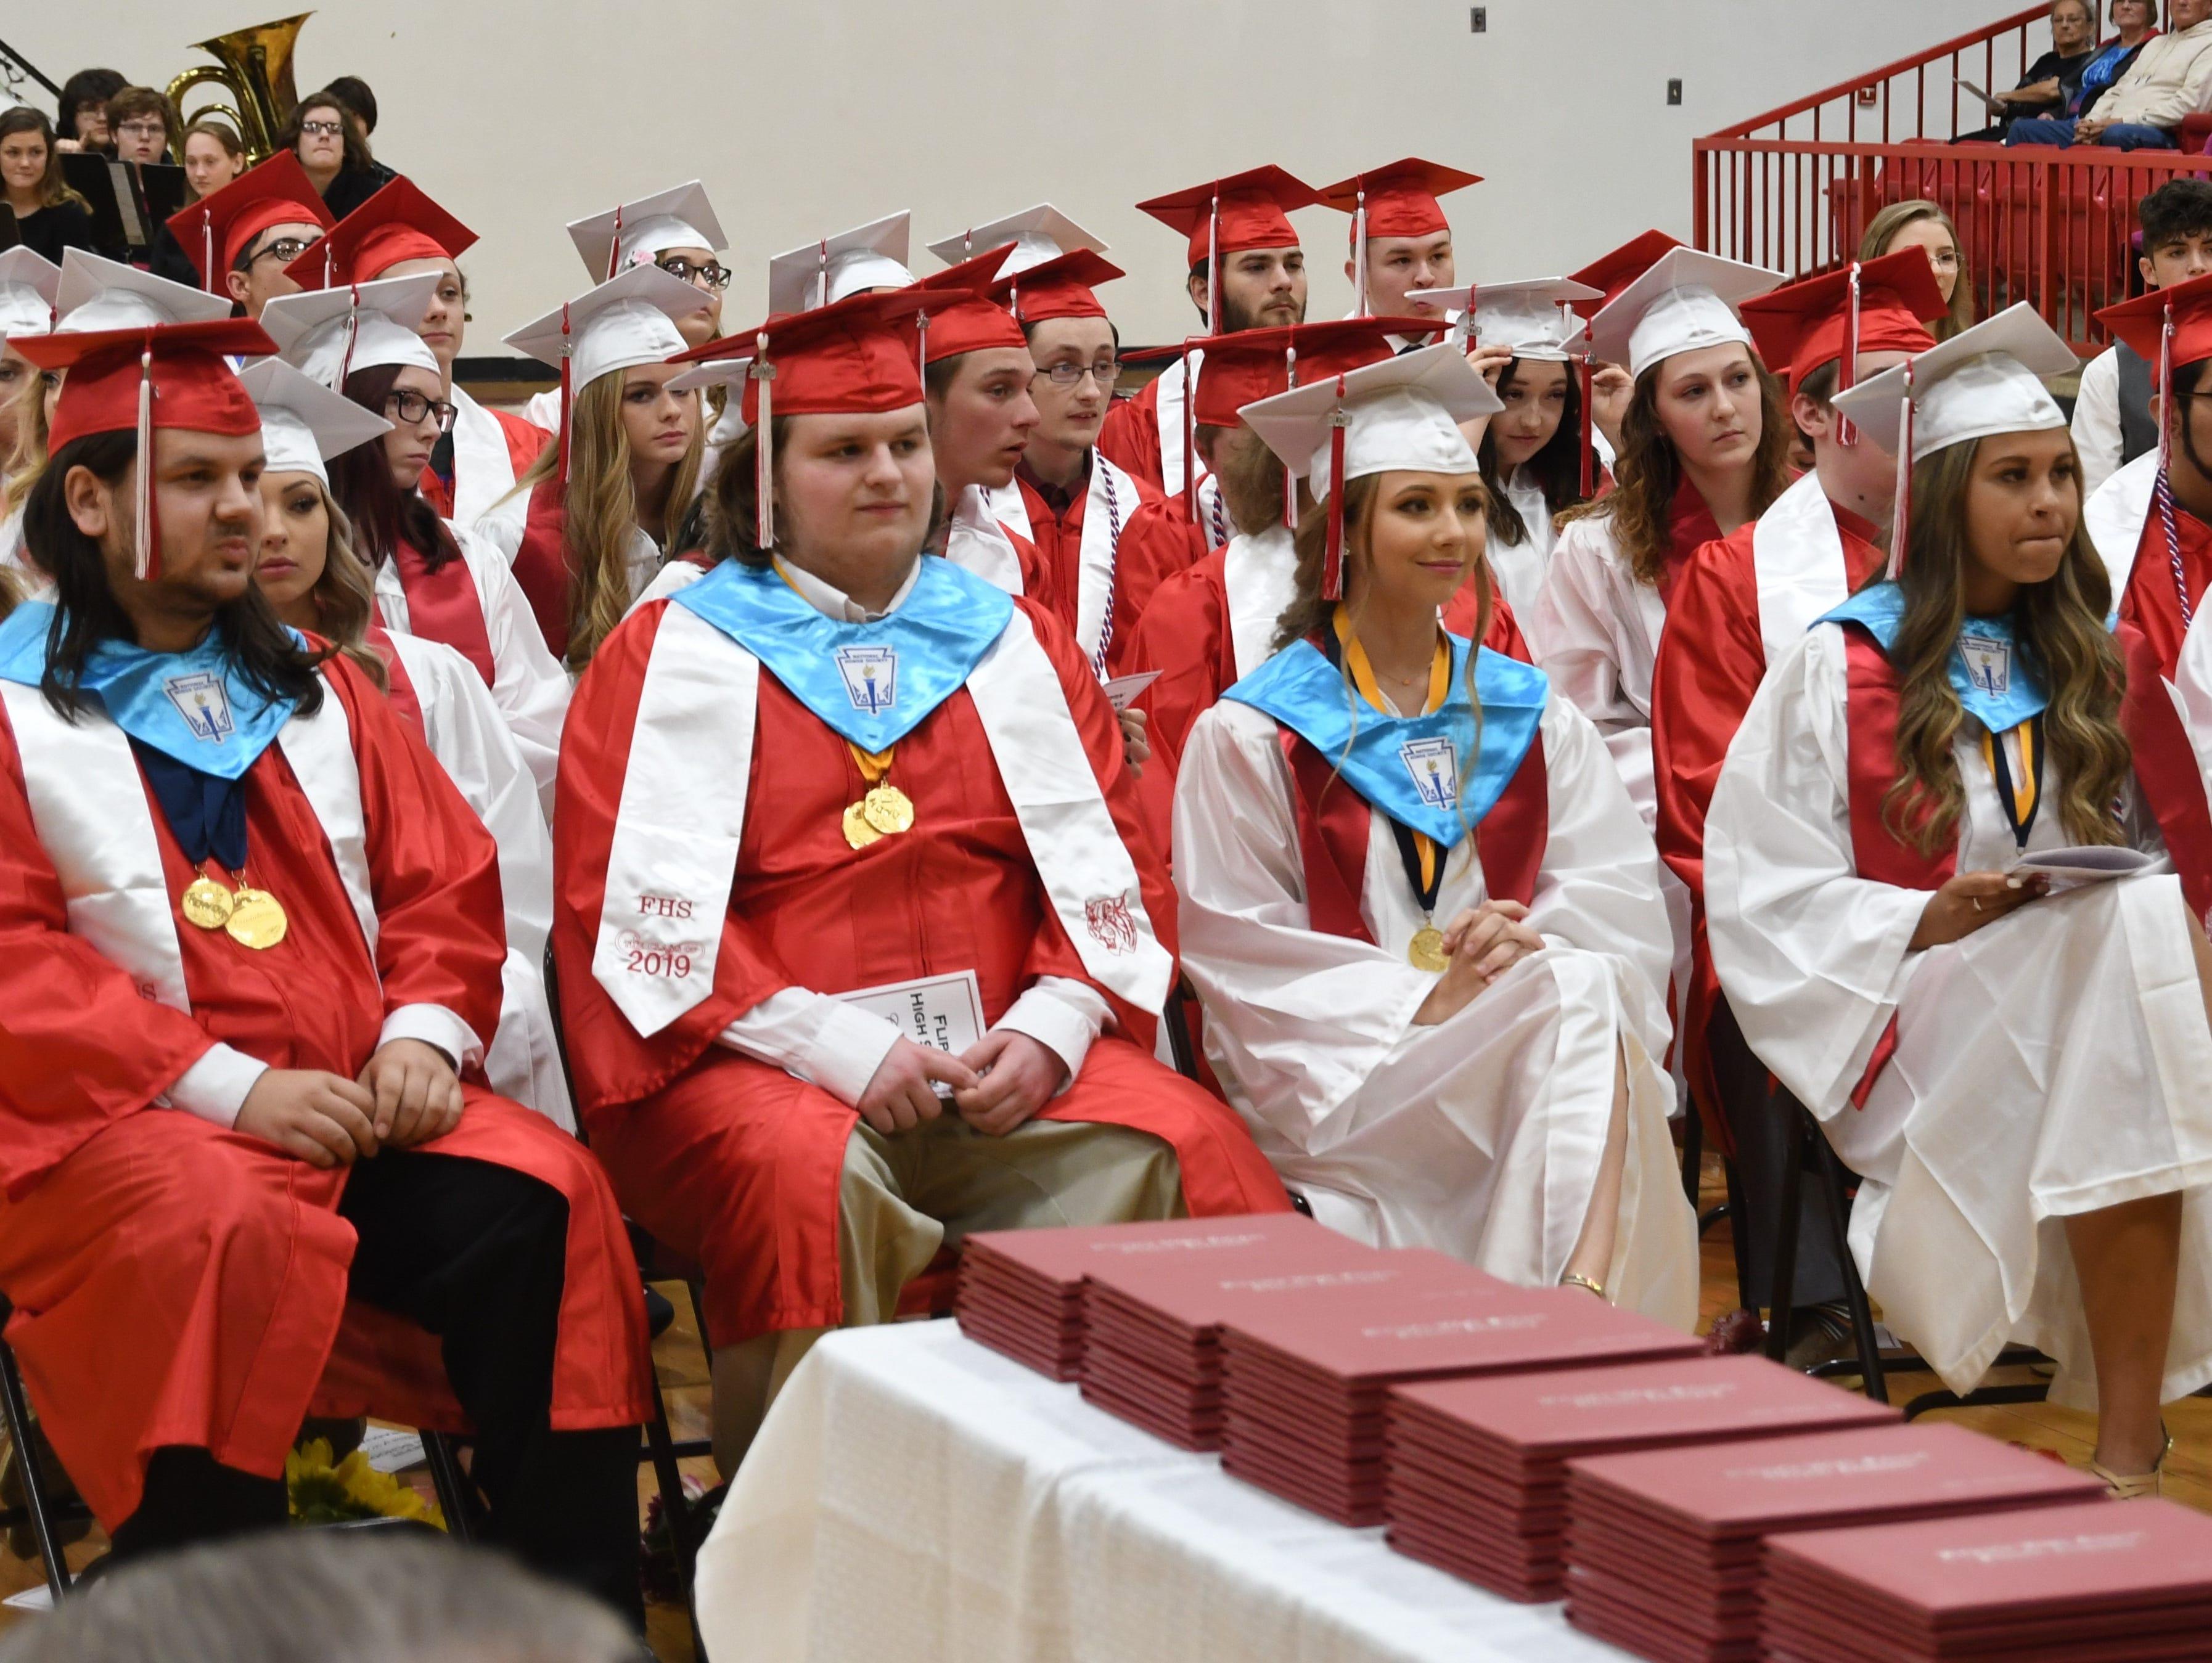 Flippin graduates watch a slideshow presentation Friday night during graduation.